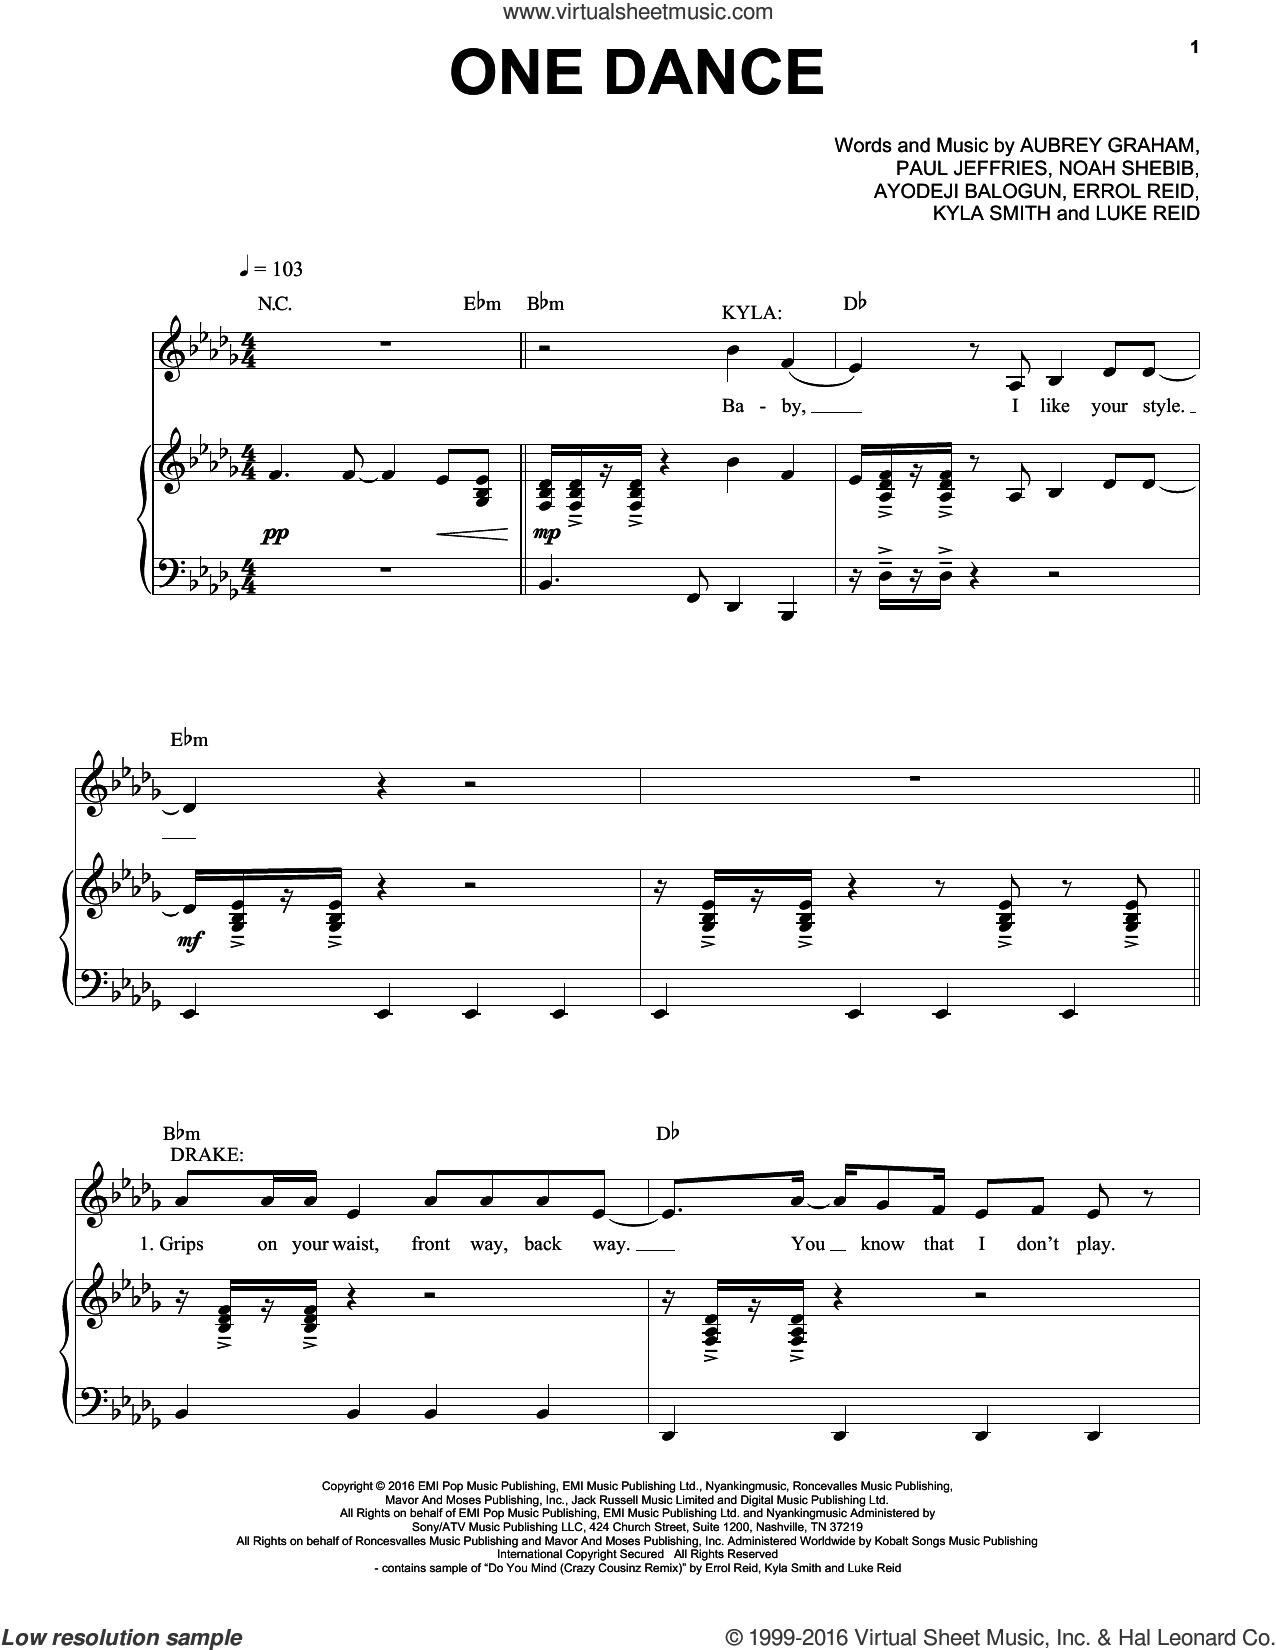 One Dance sheet music for voice, piano or guitar by Drake, Aubrey Graham, Ayodeji Balogun, Errol Reid, Kyla Smith, Luke Reid, Noah Shebib and Paul Jeffries, intermediate skill level